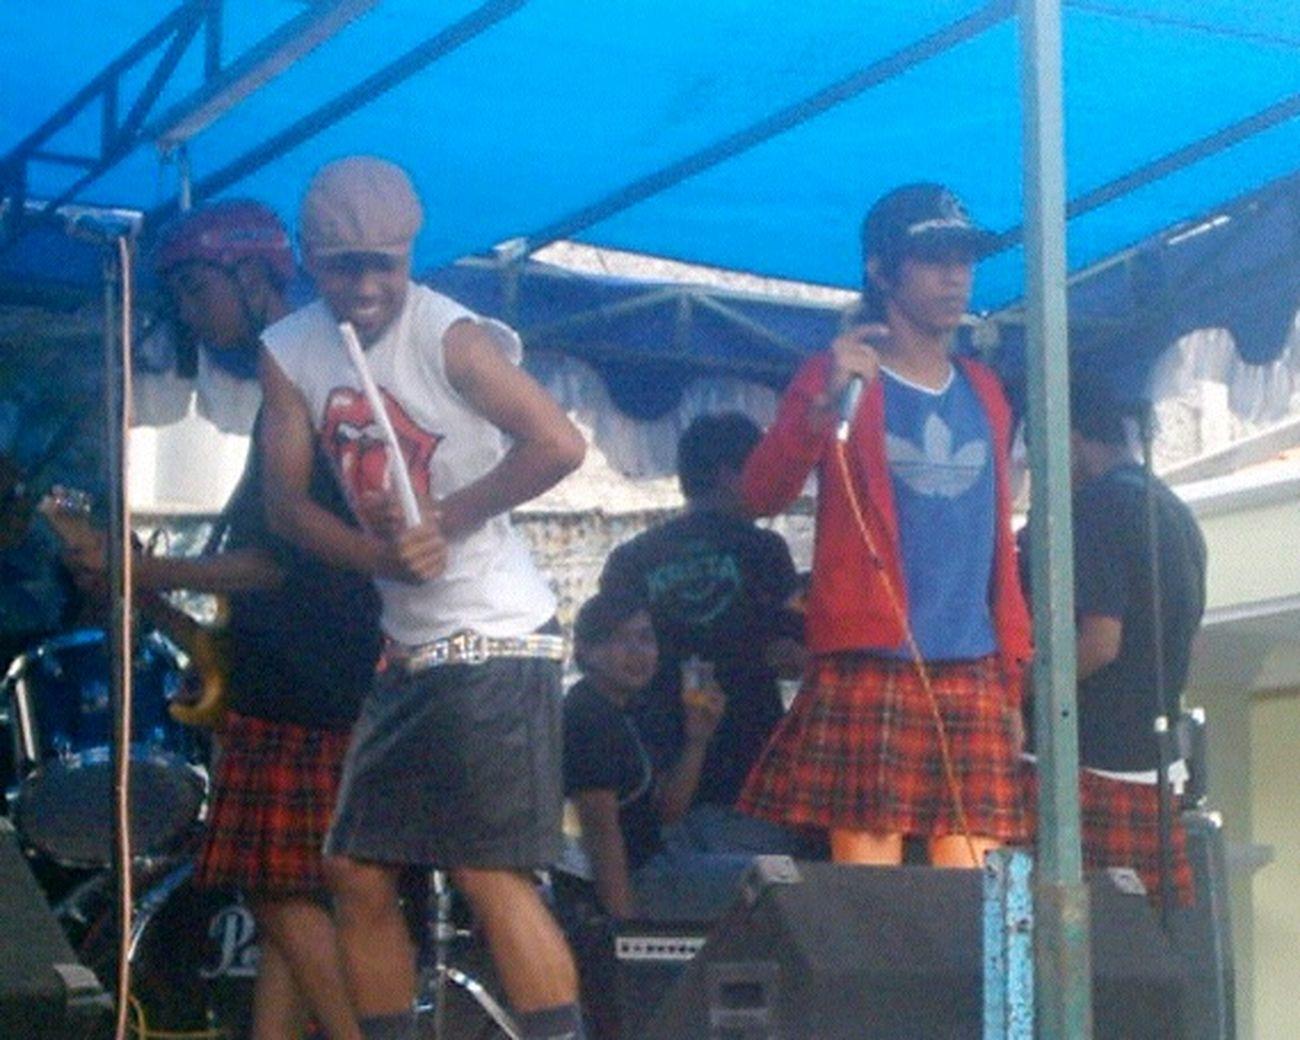 Electronic Music Shots Inauguration  Reunion  Live Music Babakancianjur BBC Babakan Cianjur Bandung Campaka